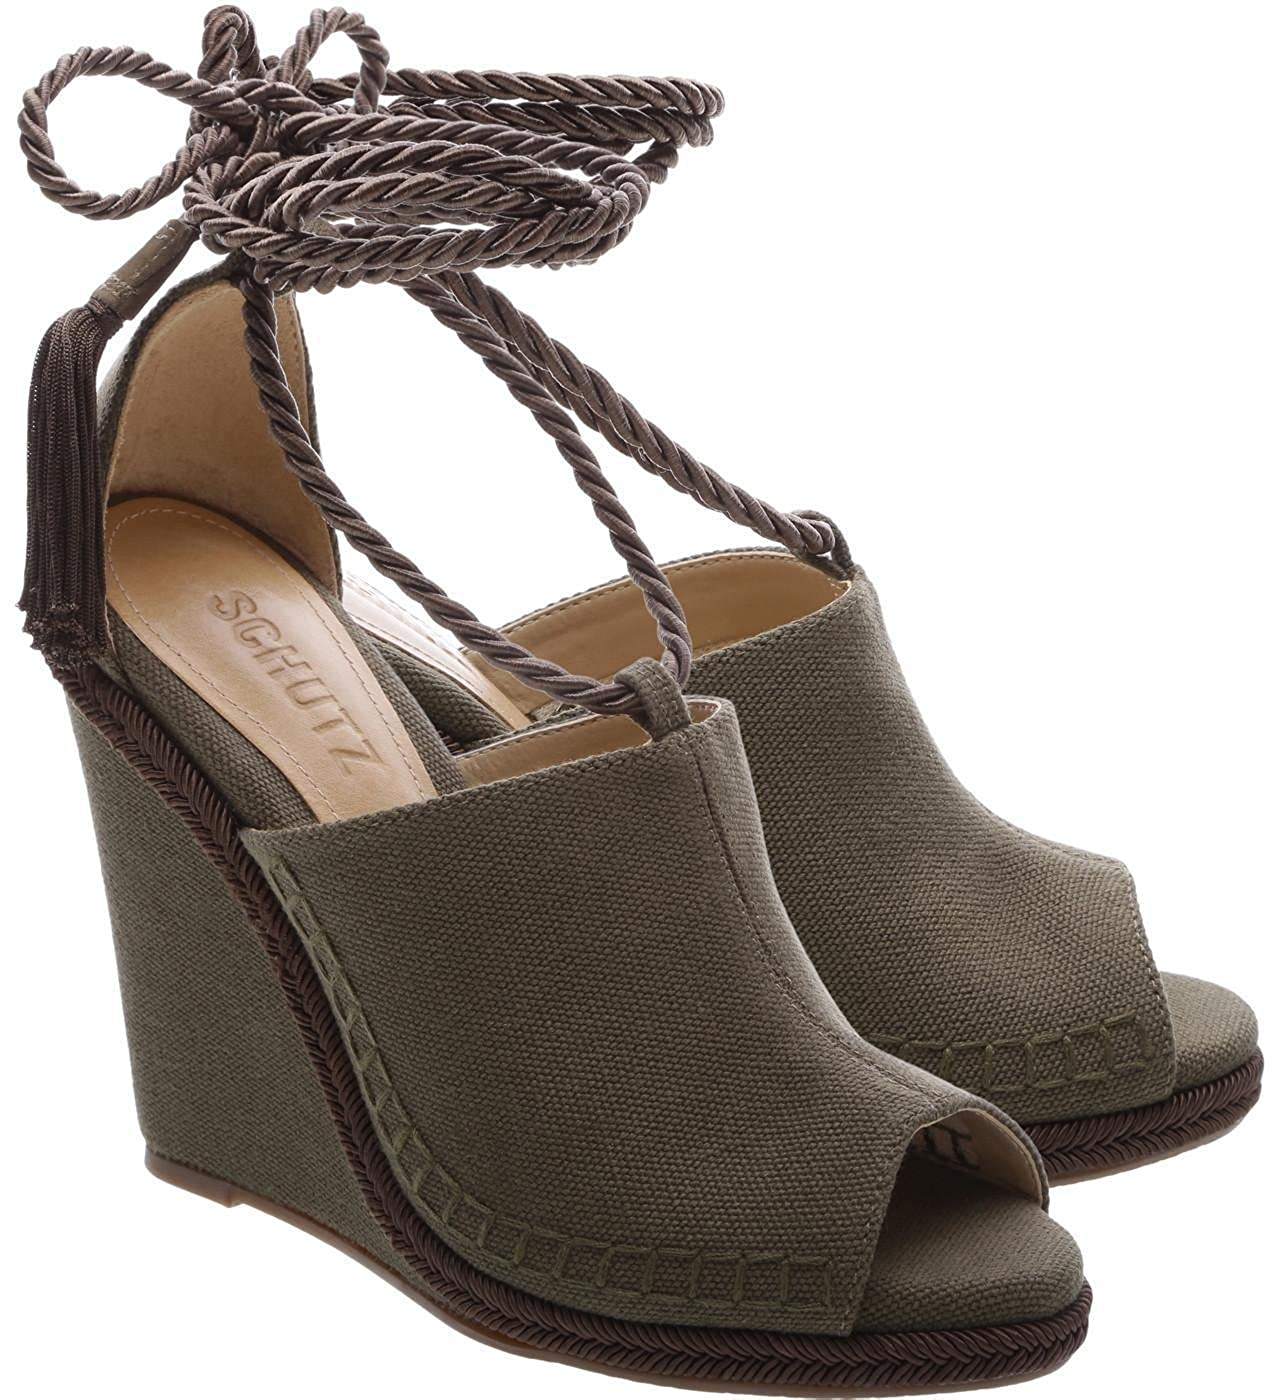 de2f3e29d6735 Amazon.com: SCHUTZ Caetana Dark Olive Green Peep Toe Canvas Tie Up ...